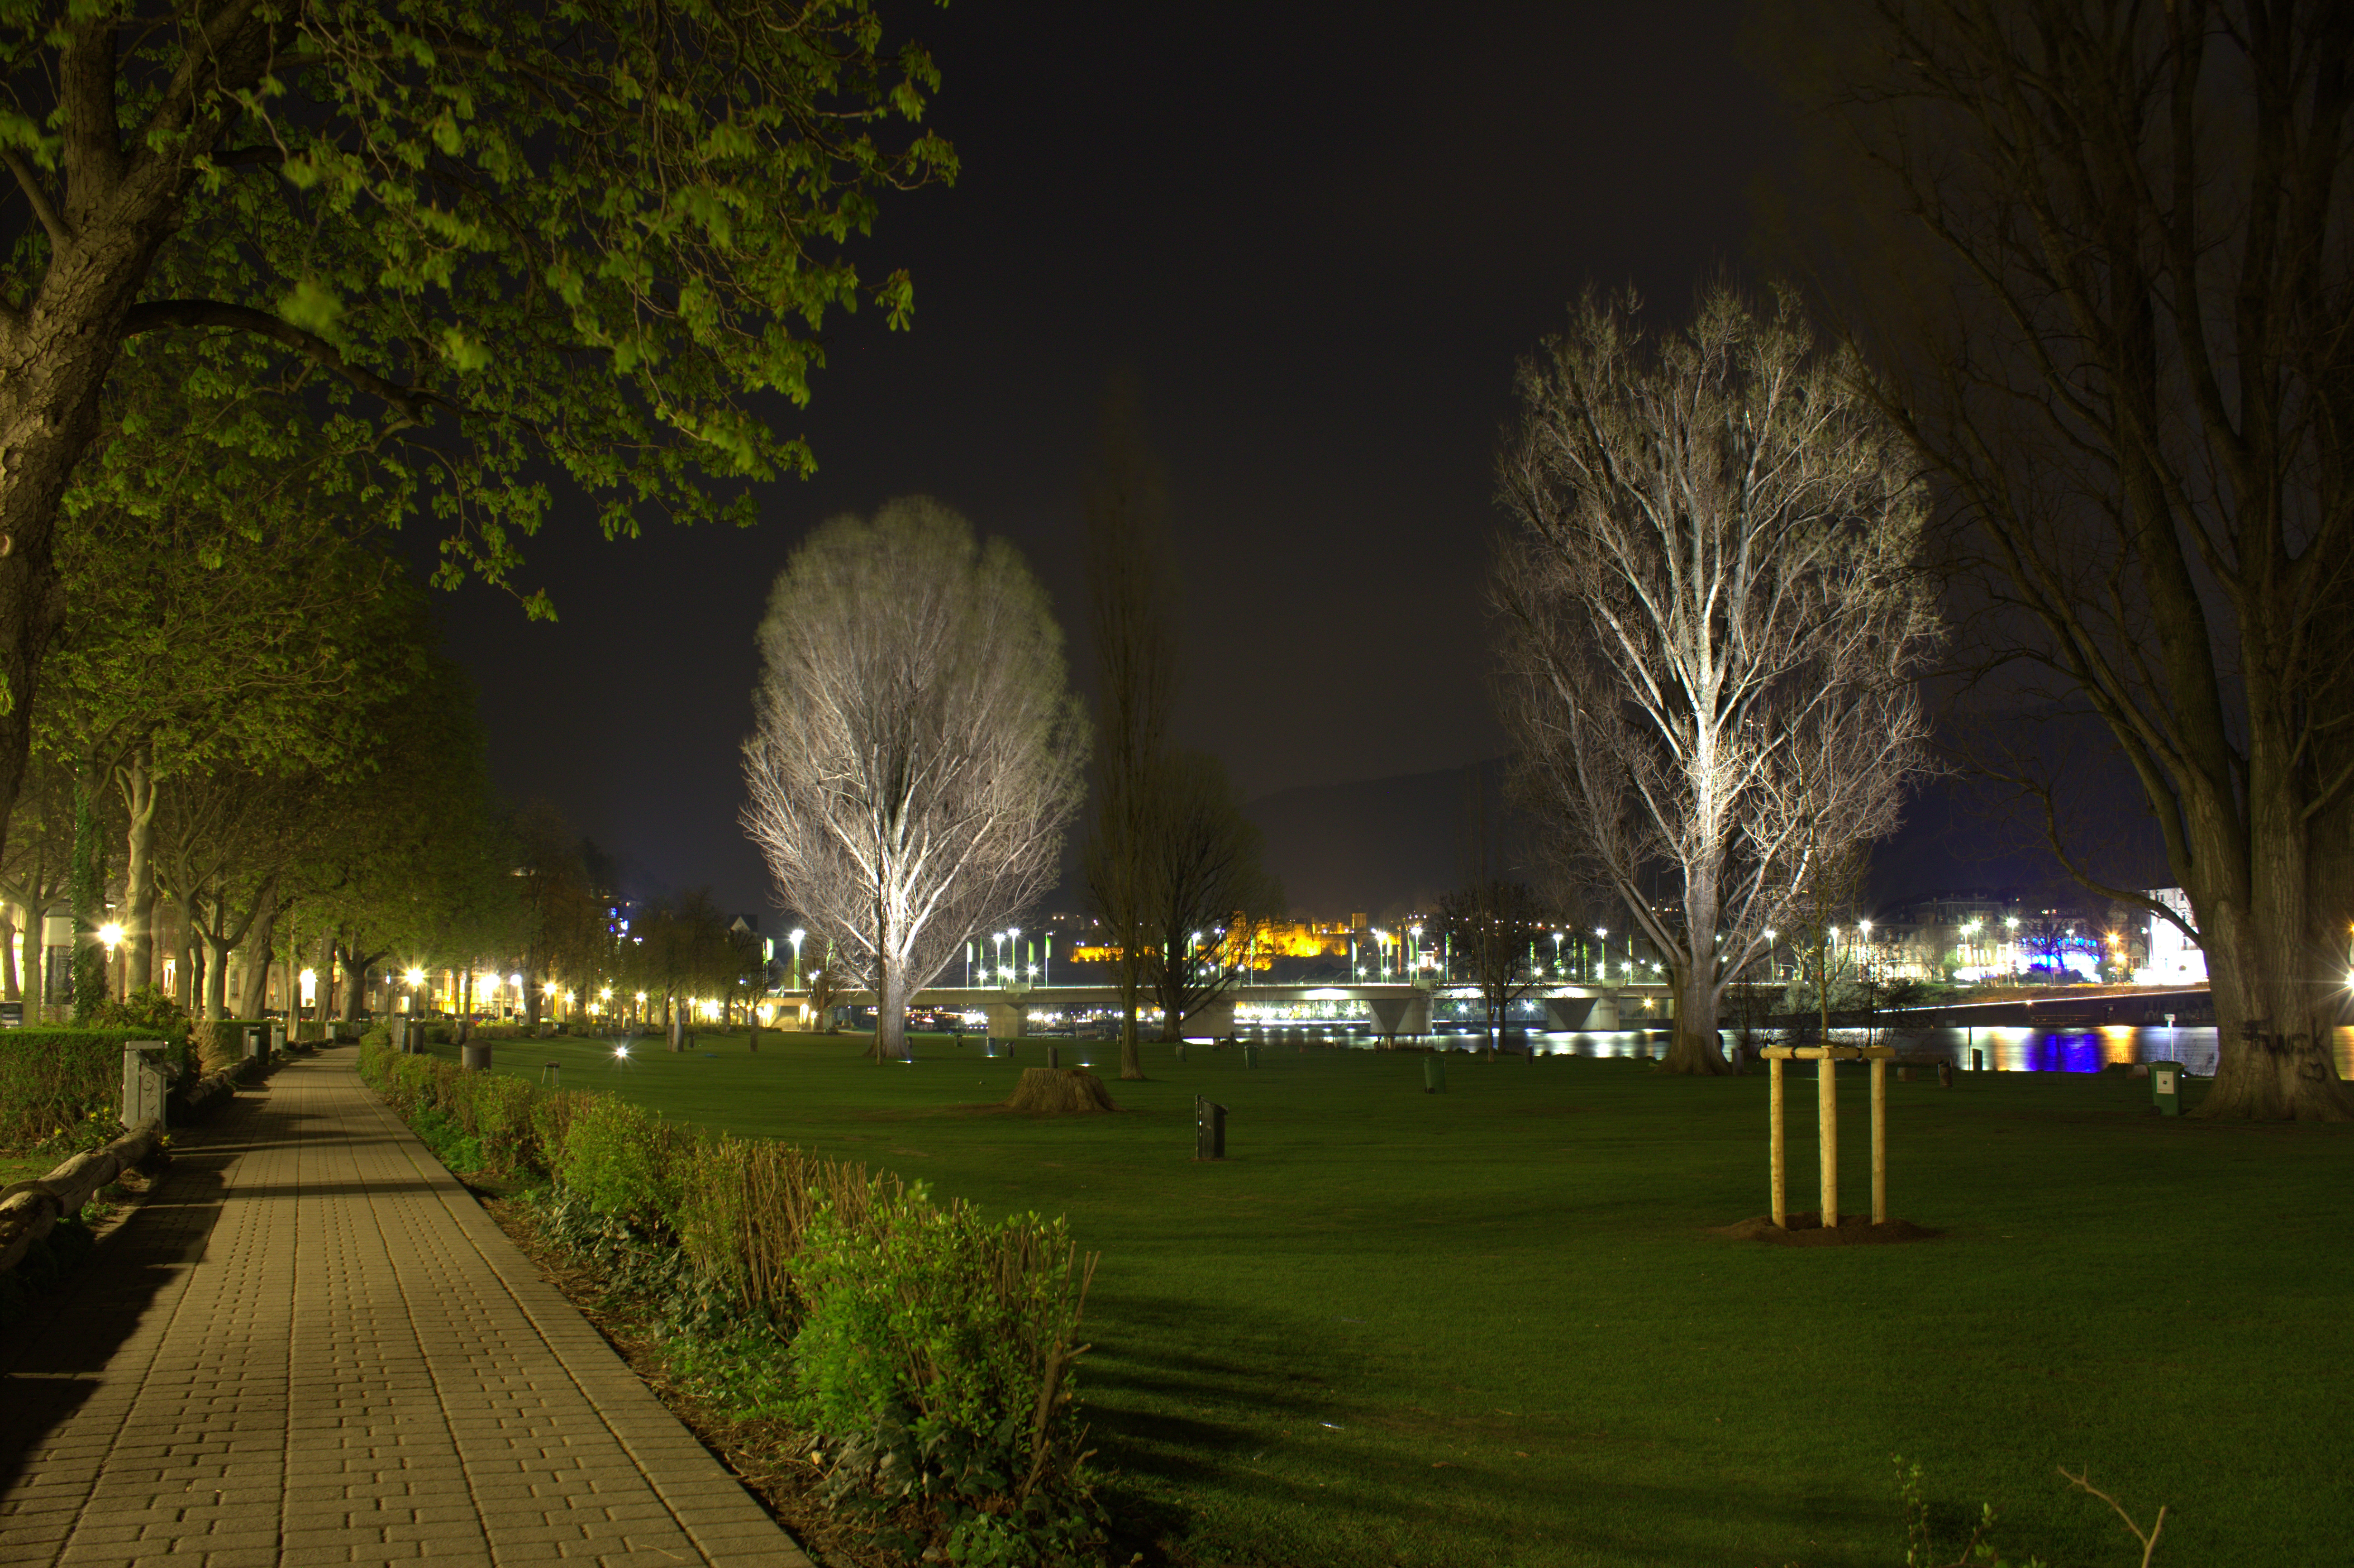 Romantik adé - schon bald soll hier die Nacht zum Tag werden. Bild: By JHenryW [CC BY-SA 3.0], from Wikimedia Commons